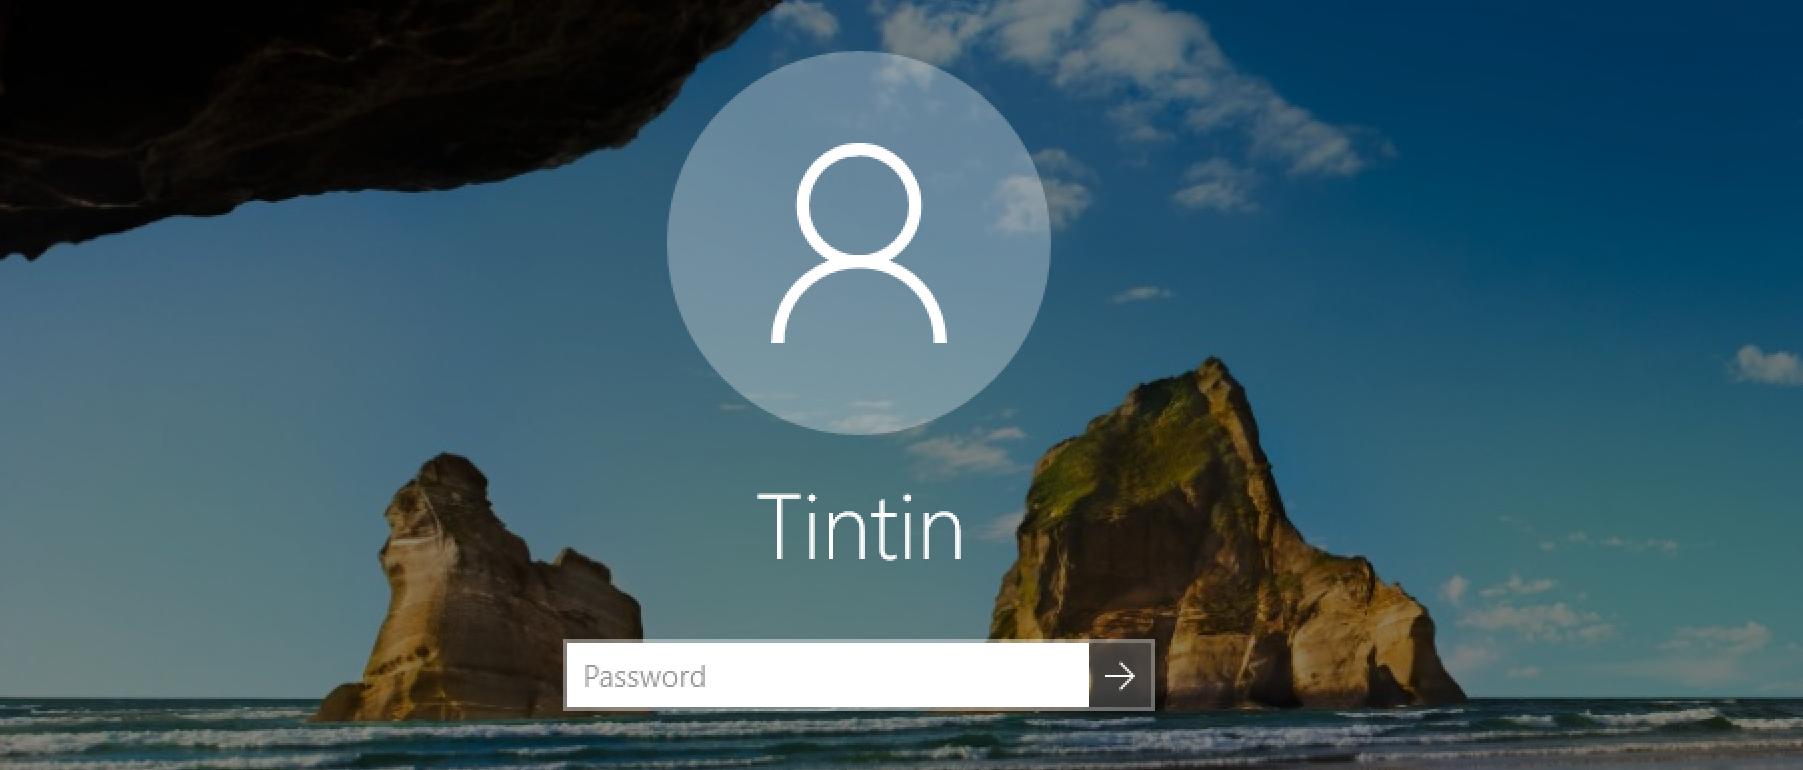 log in to local windows 10.1 user account tintin